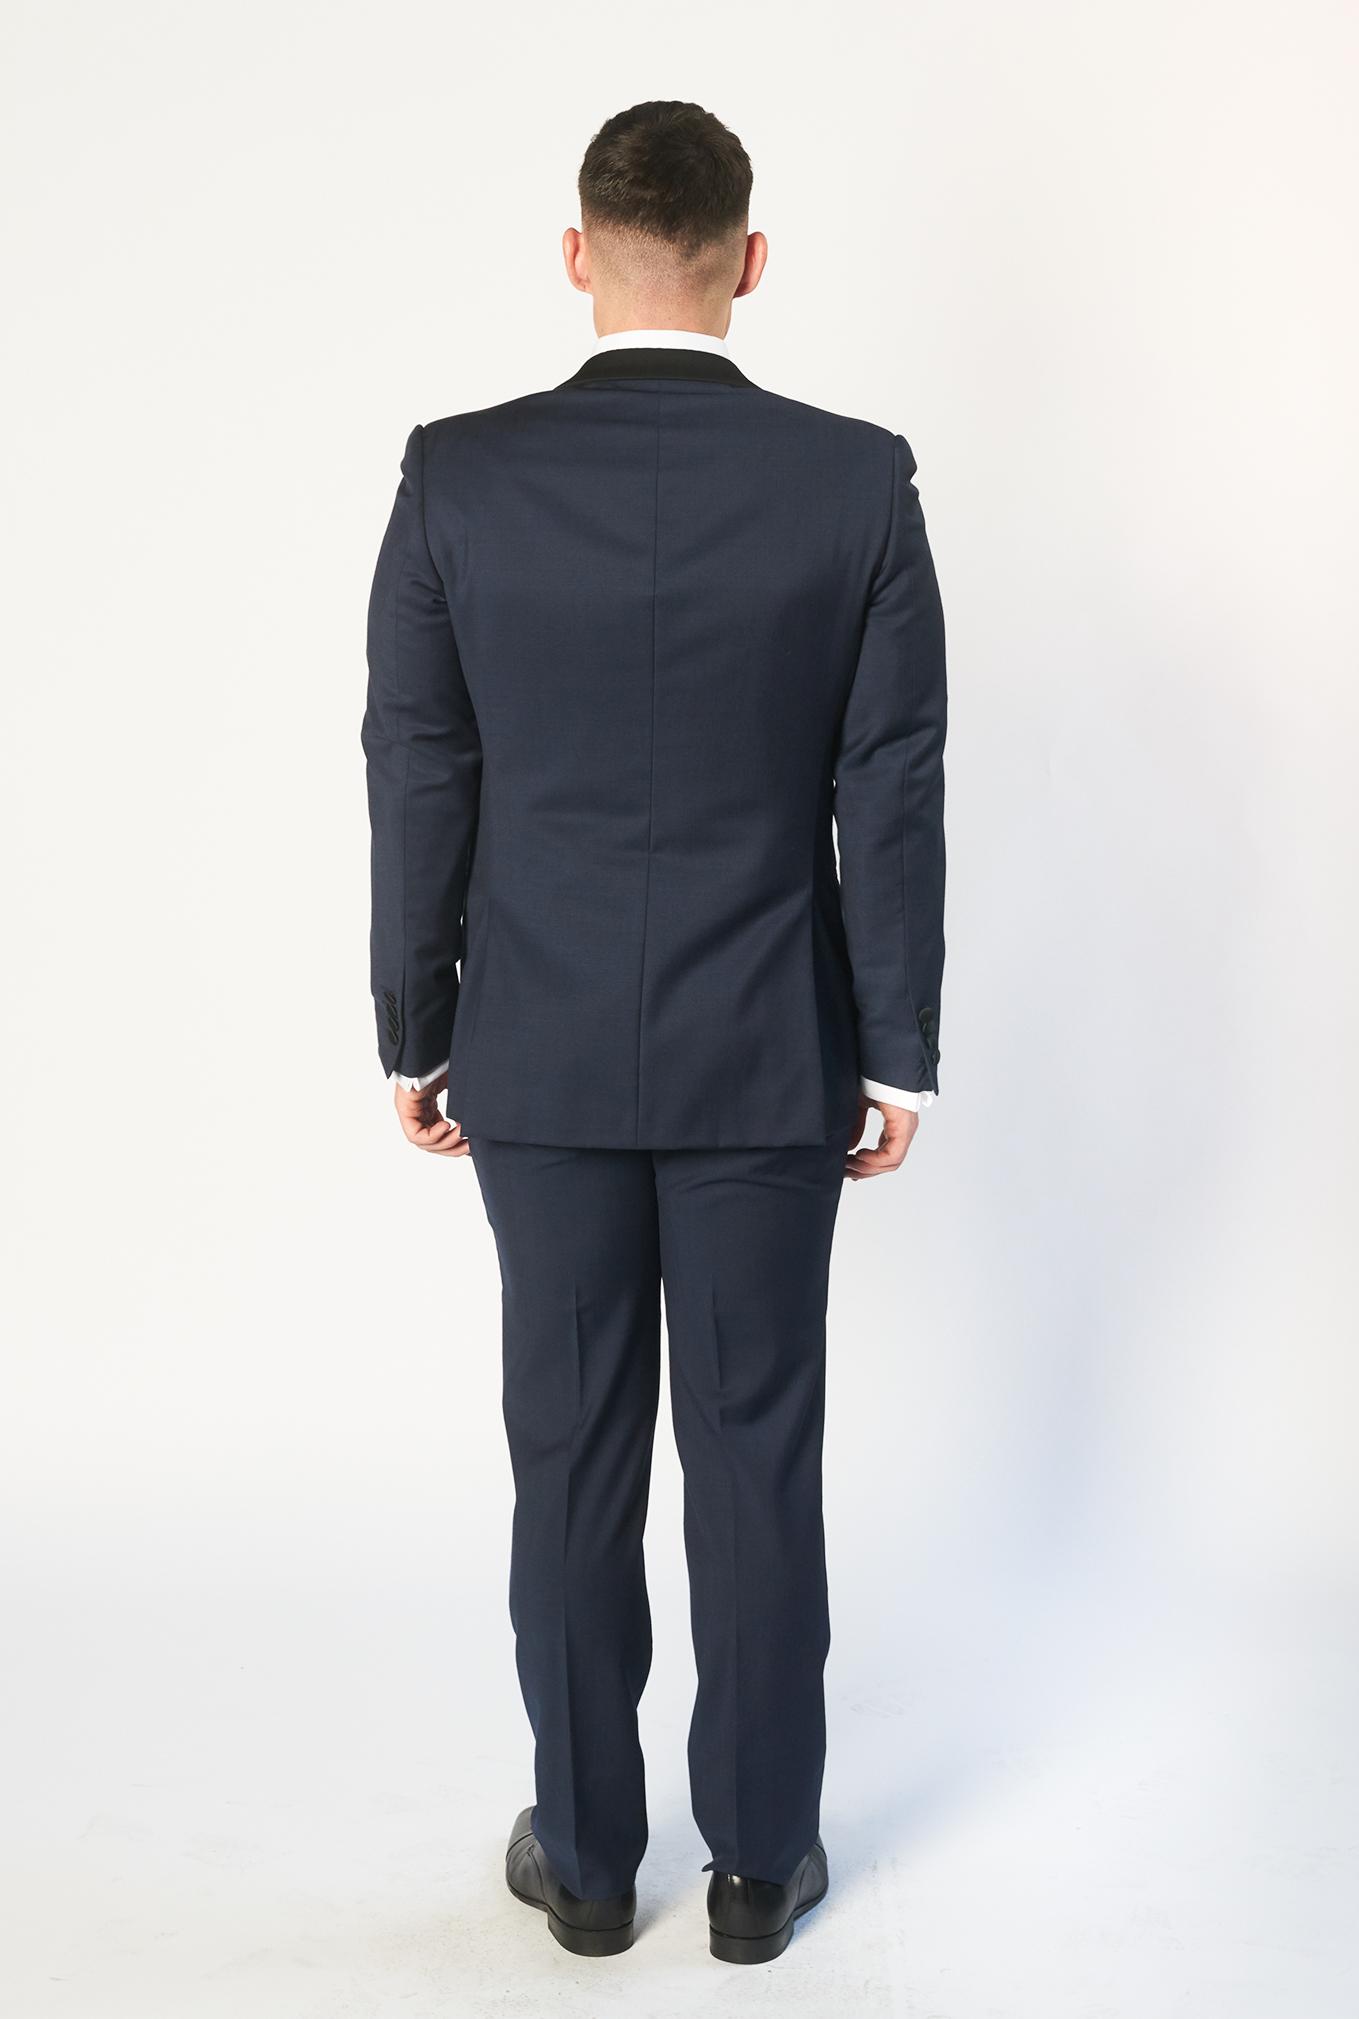 The Bond tuxedo back view